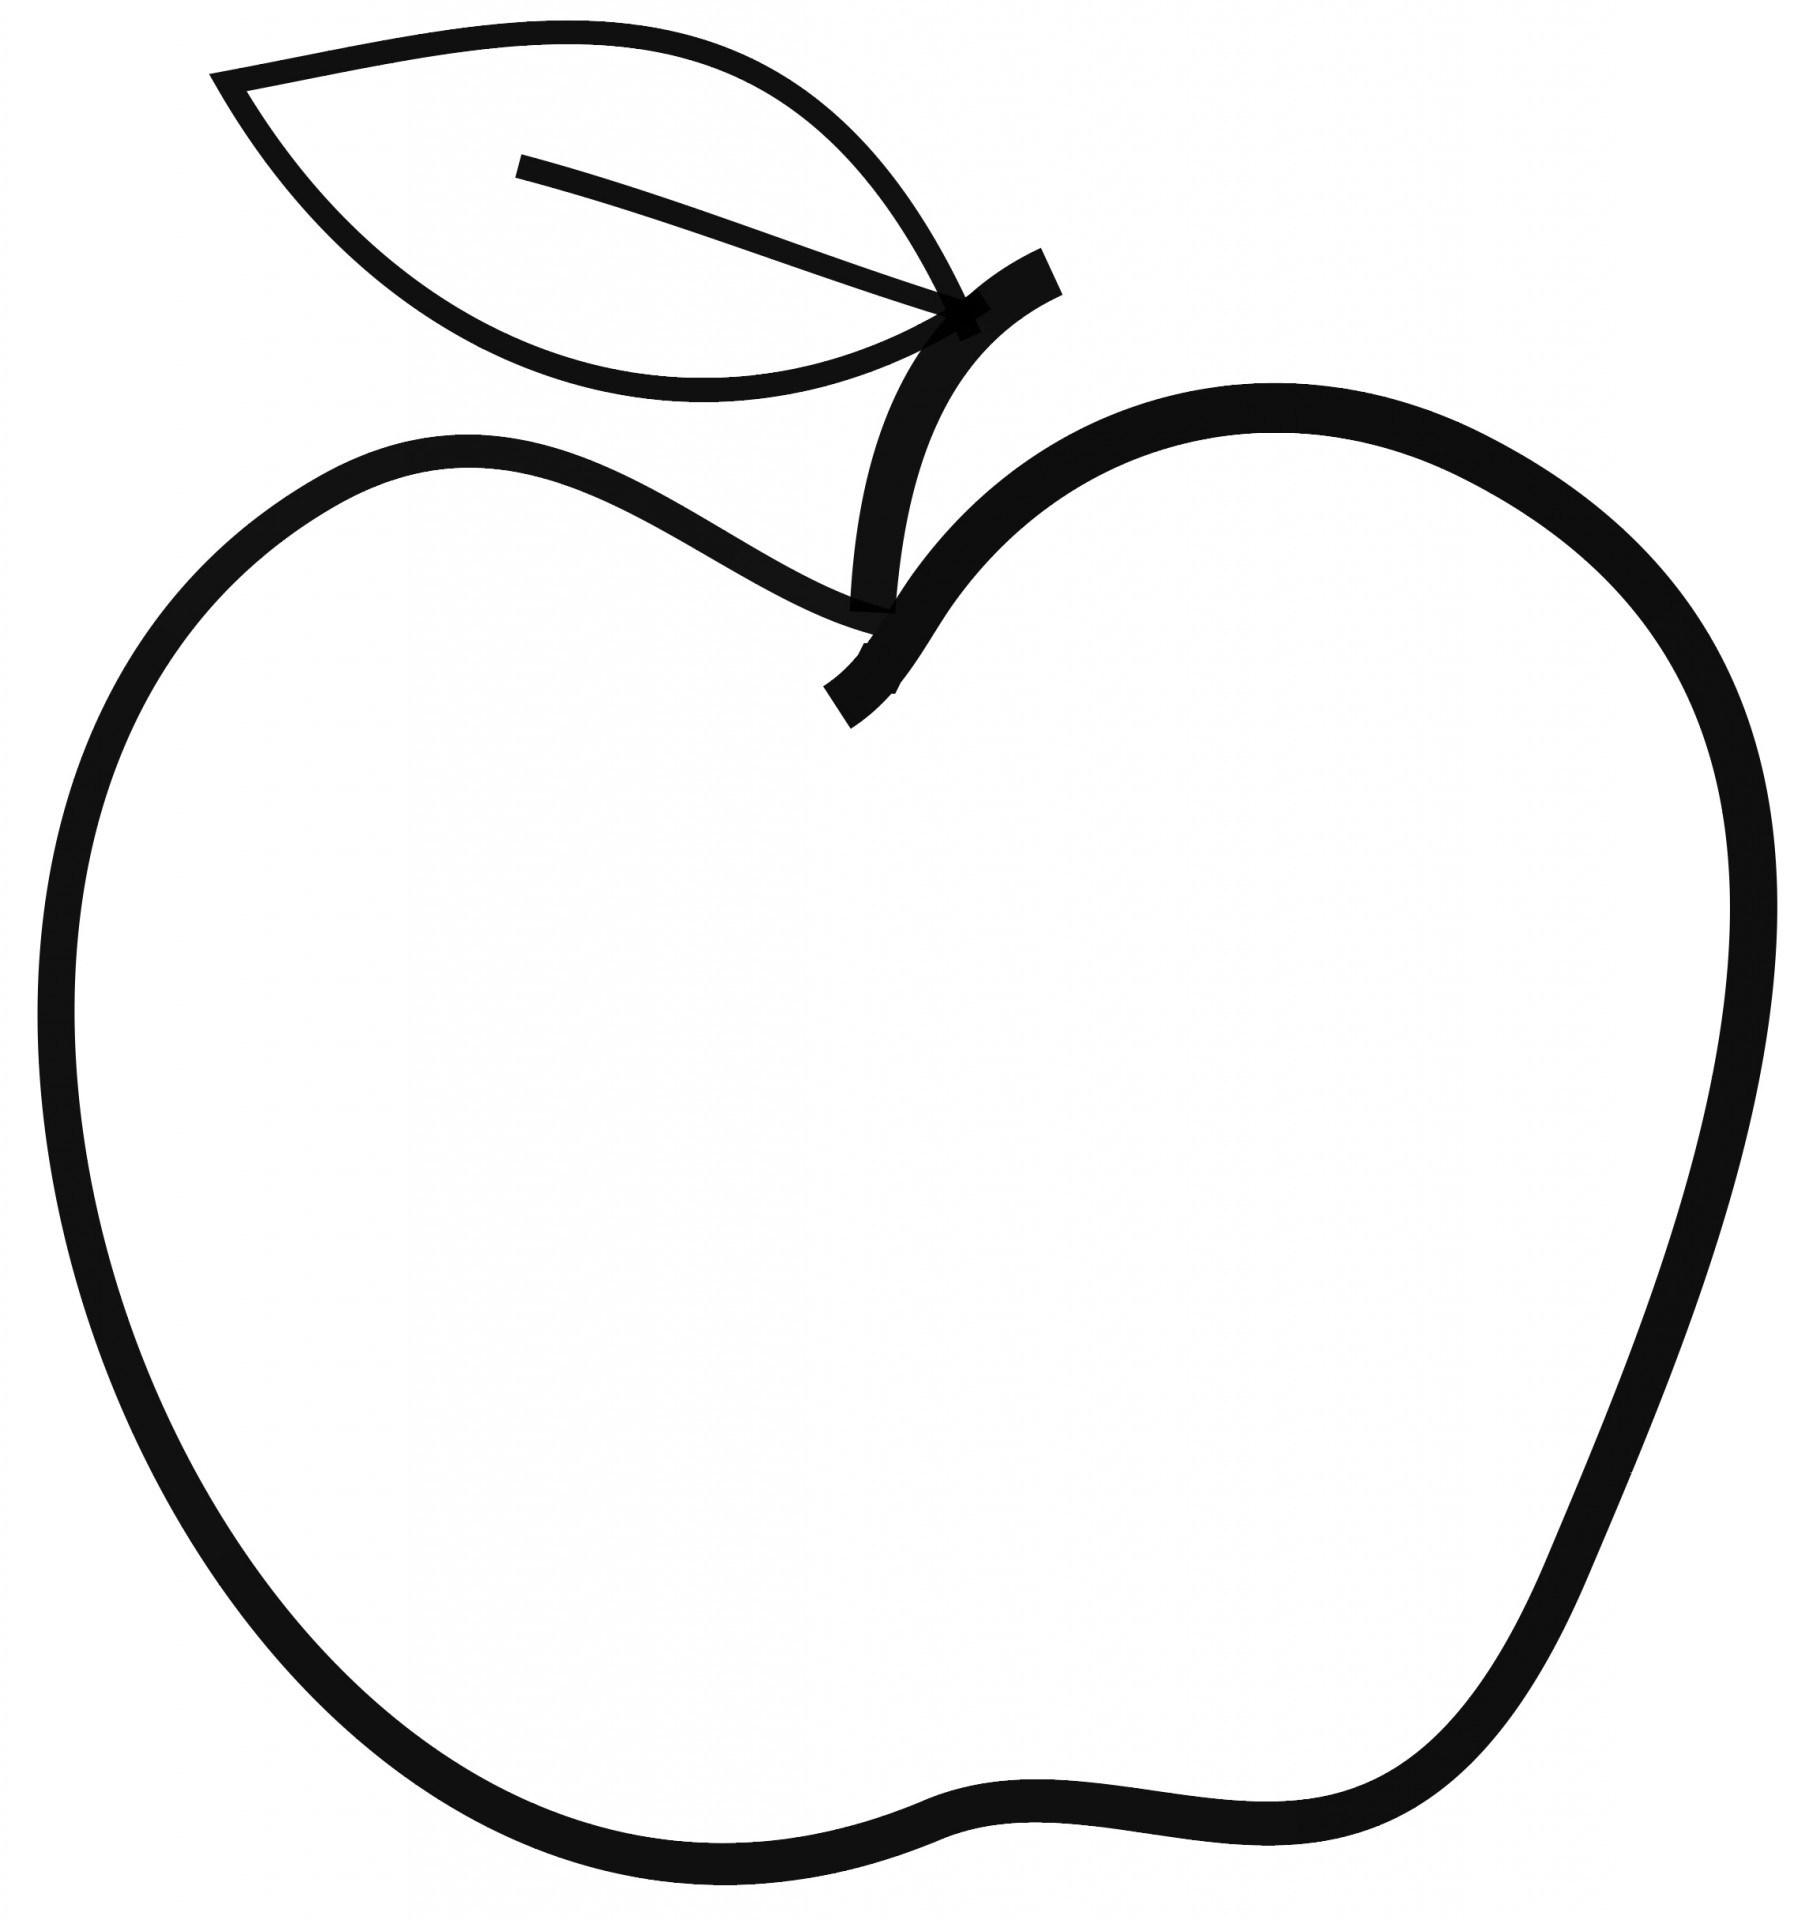 Black and white 3 clipart clipart black and white Apple clipart black and white 3 » Clipart Portal clipart black and white